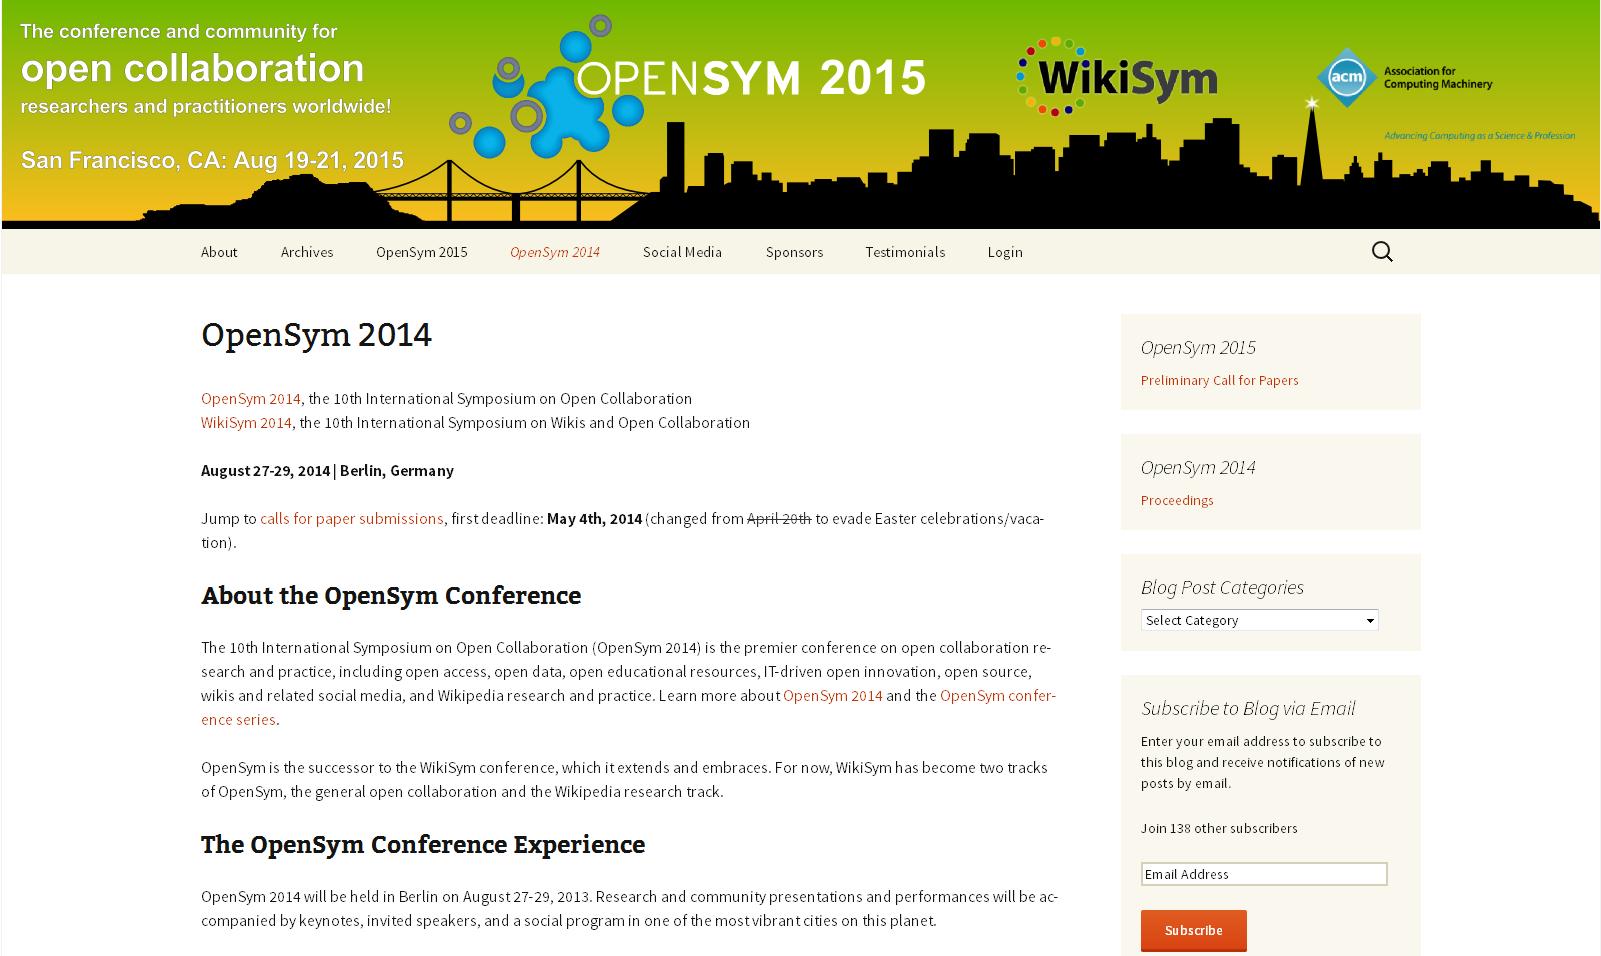 OPENSYM 2014 - 10th International Symposium on Open Collaboration